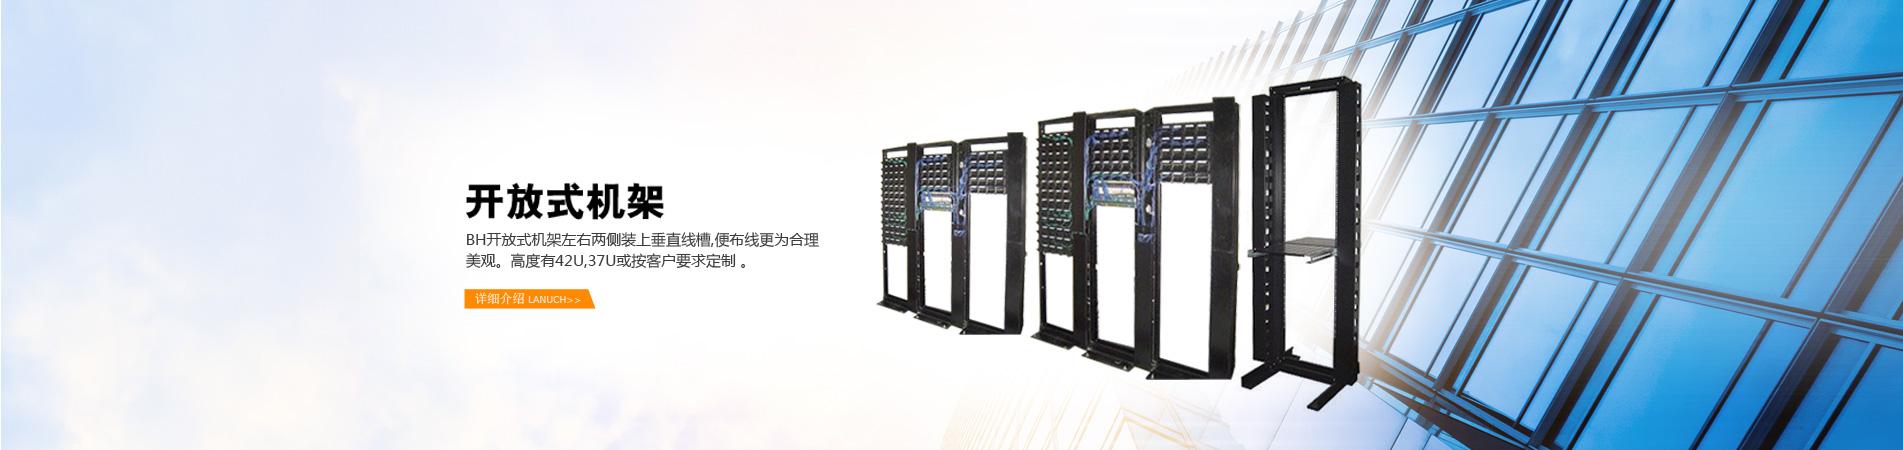 http://m.juhua358238.cn/03200123/php/pic.php?menuid=6&item1id=3&lang=0